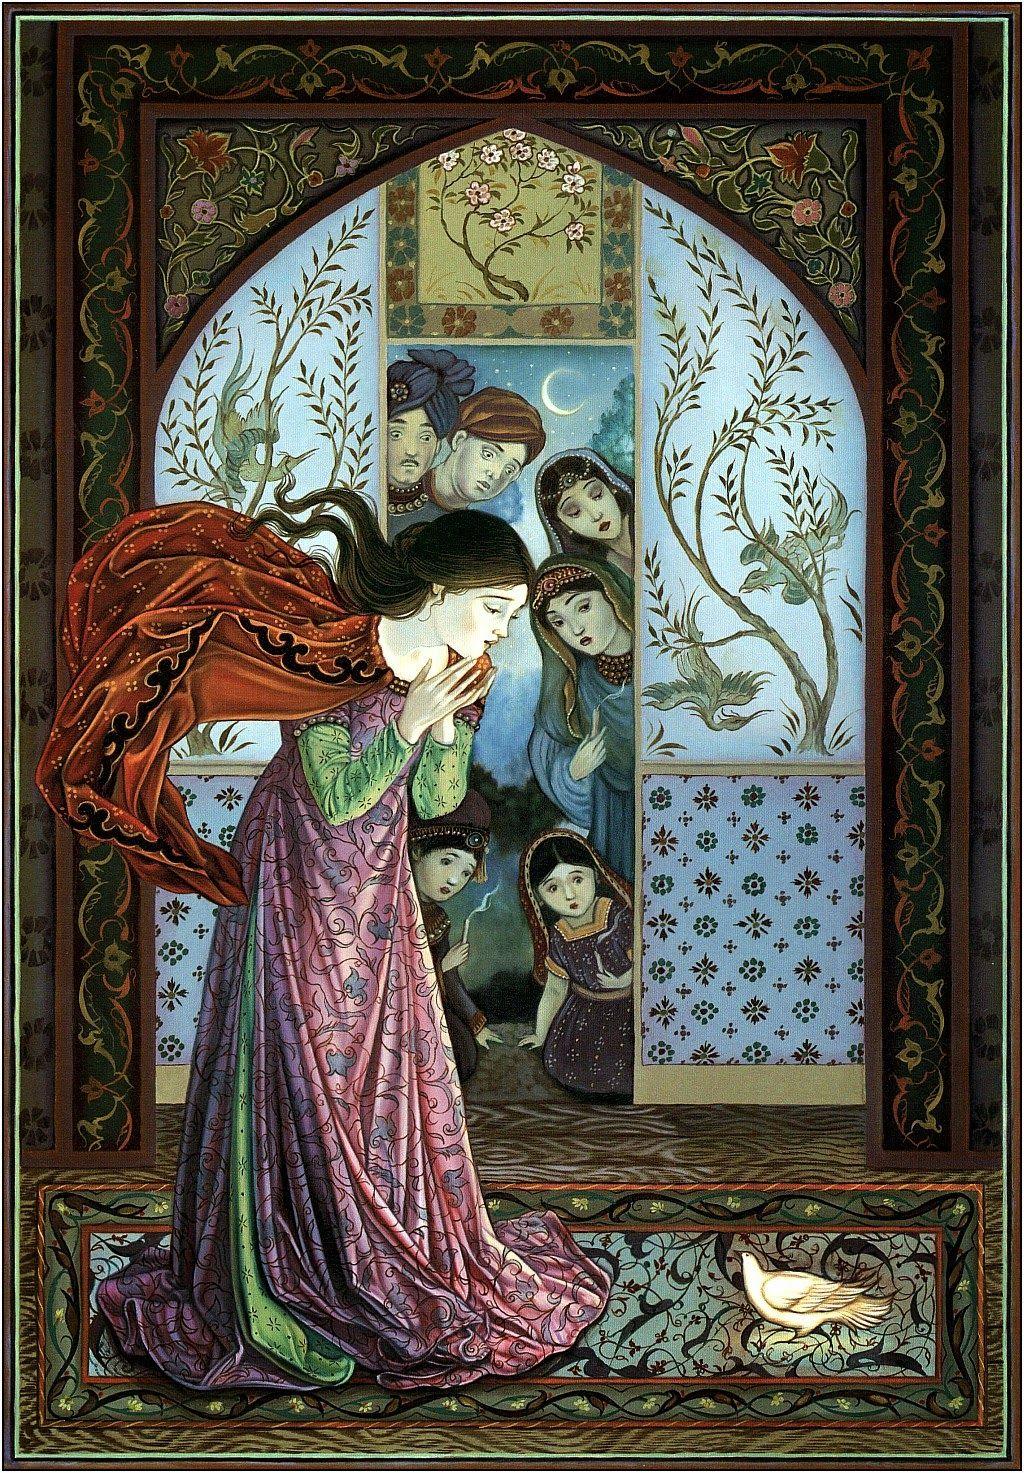 Lo specchio cielo amore e psiche arte arte fantas a libros ilustrados e cuento de hadas - Lo specchio nell arte ...